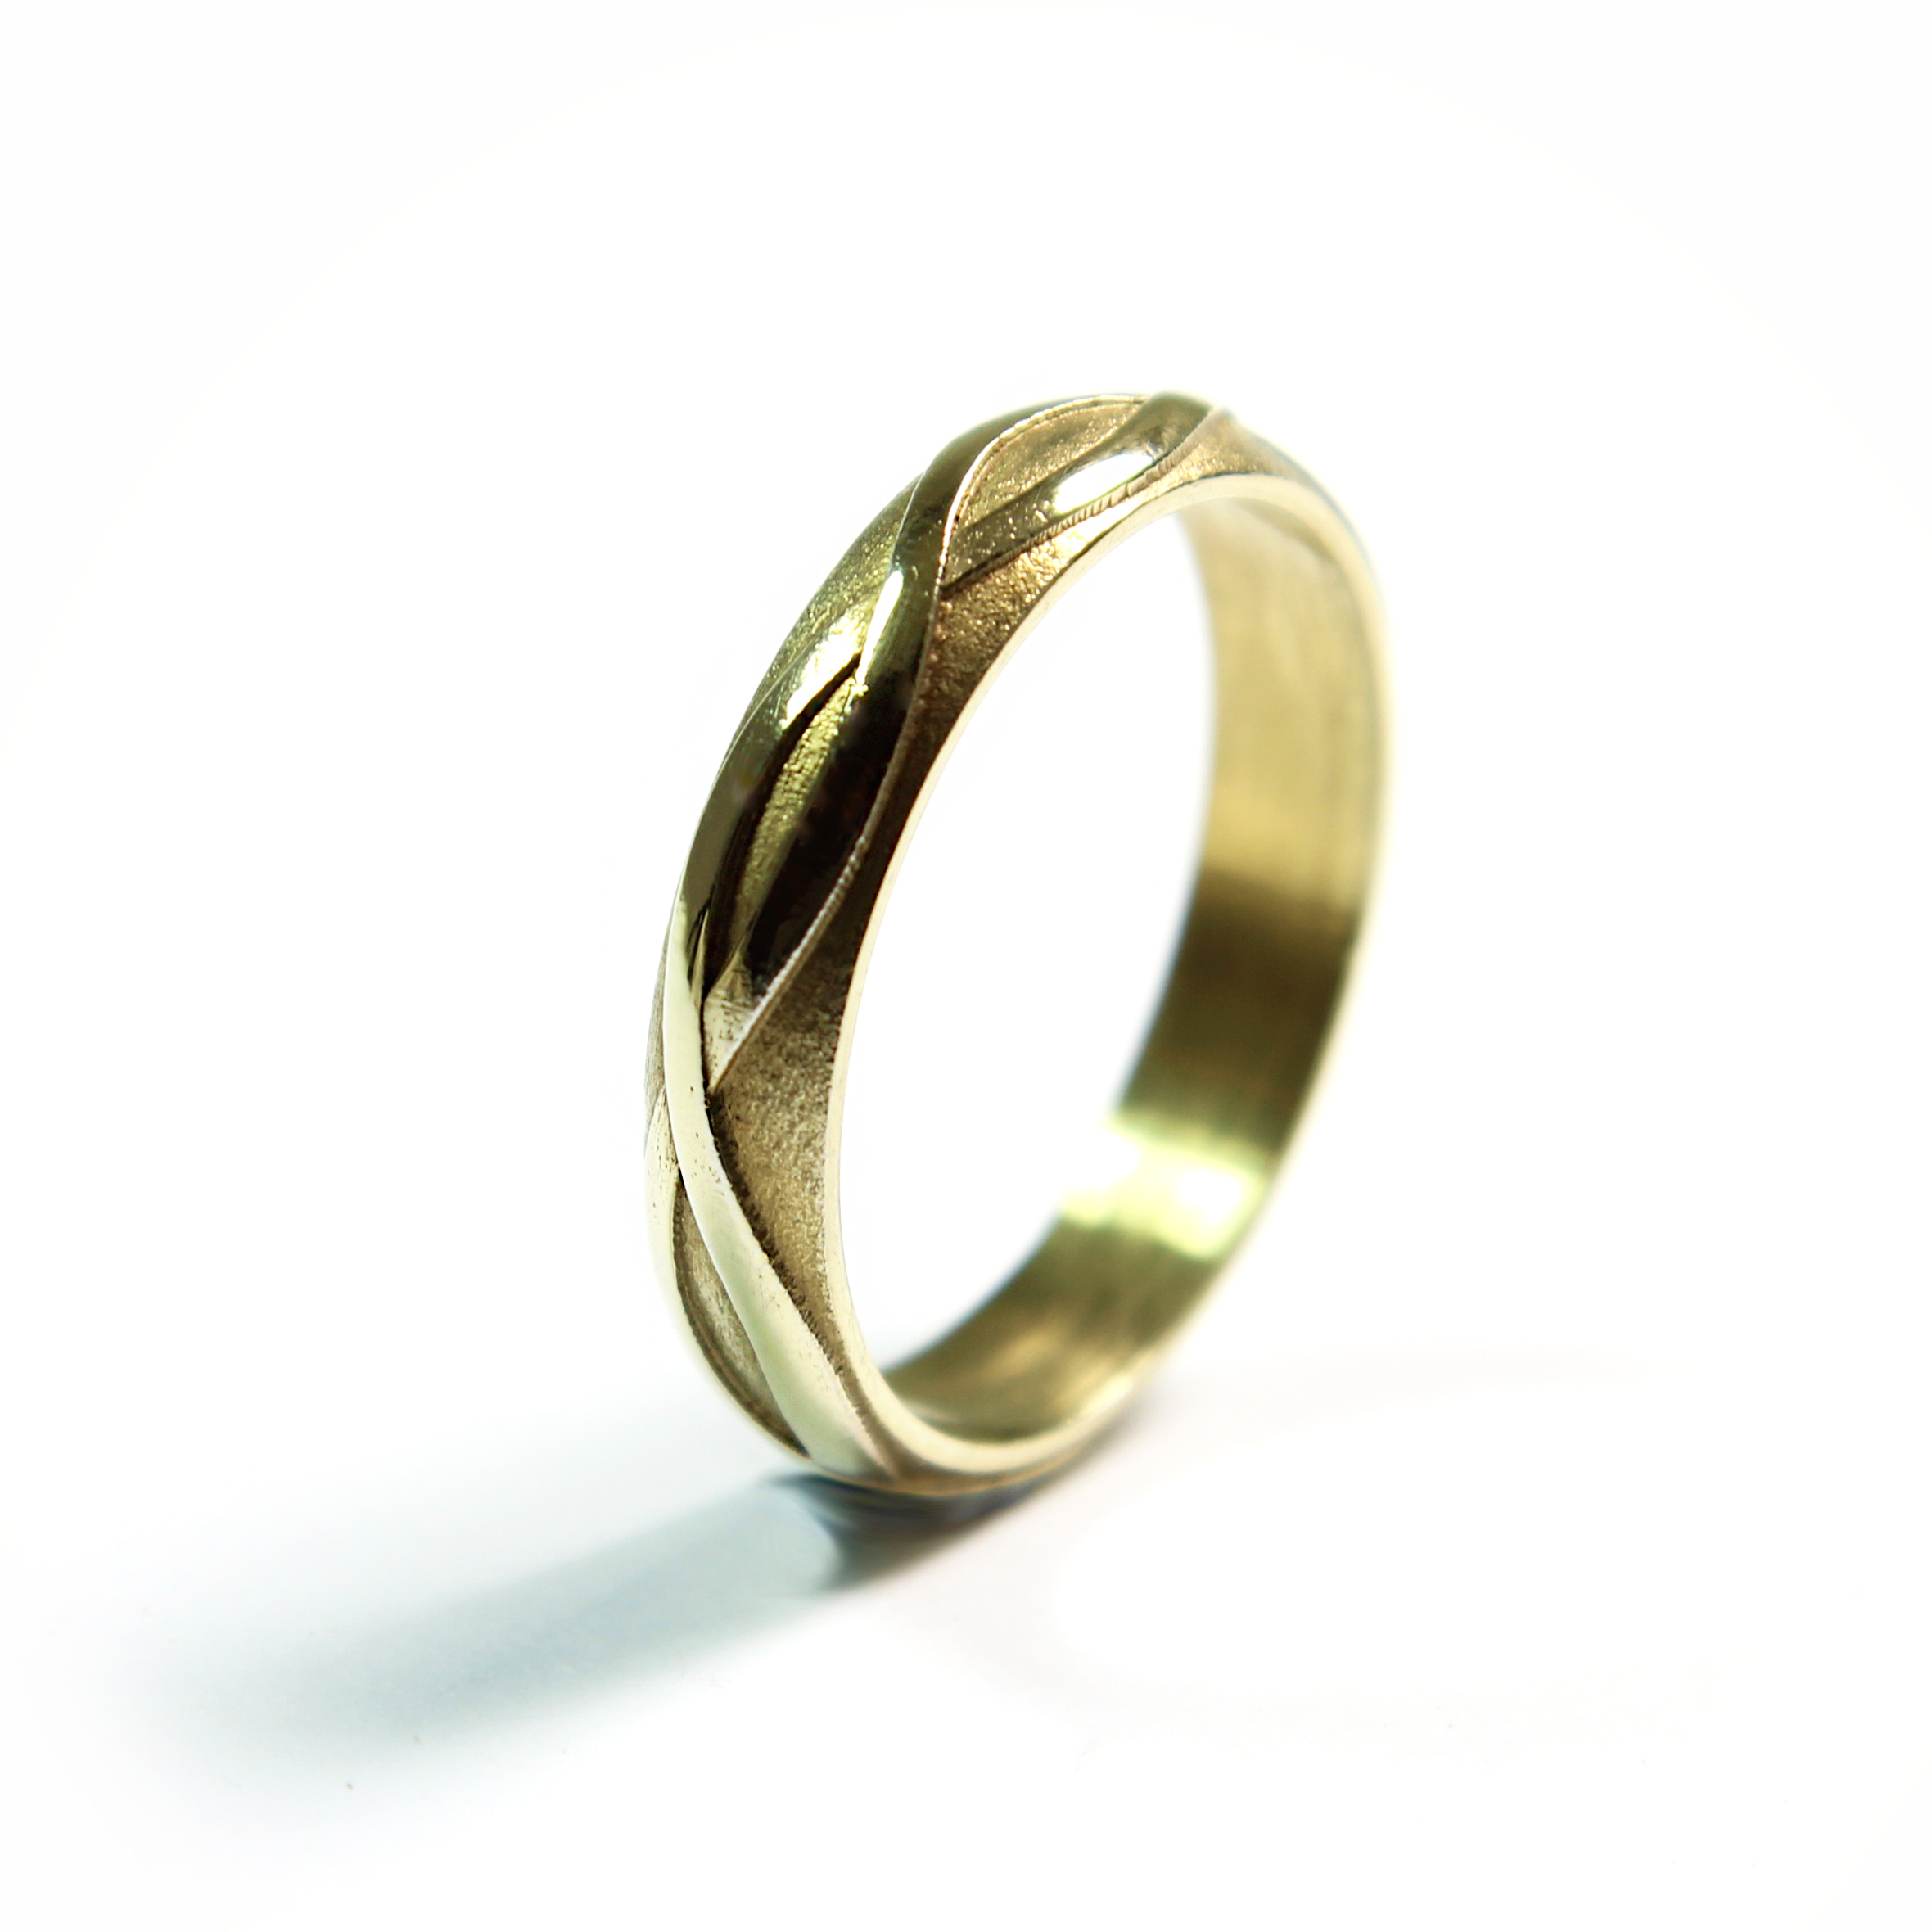 My Interlace wedding ring....